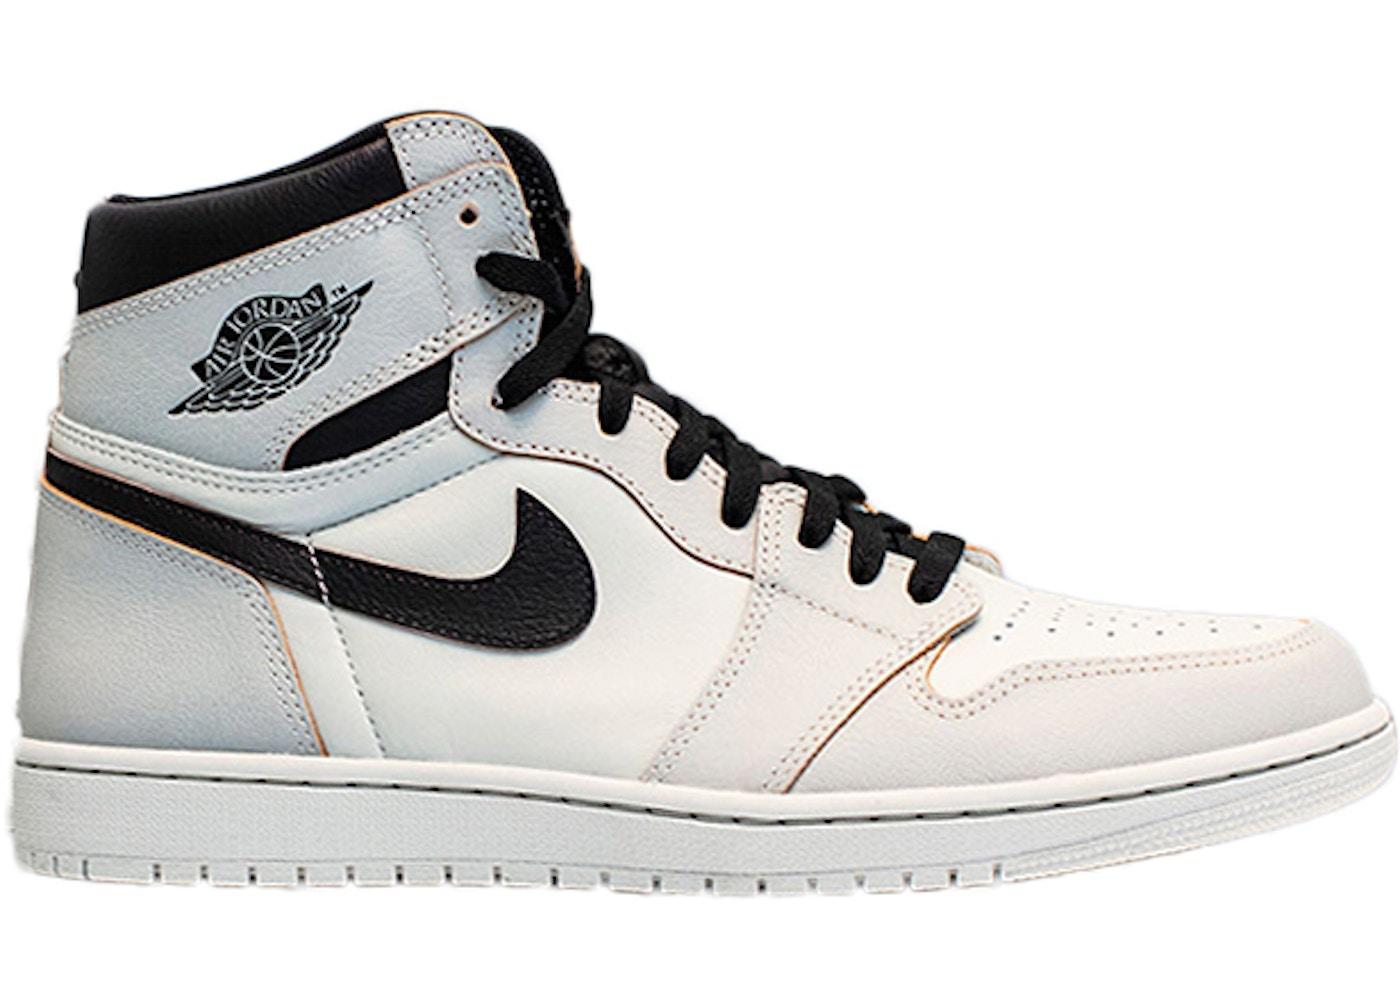 quality design 9b17c 0c8a6 Buy Air Jordan Shoes   Deadstock Sneakers